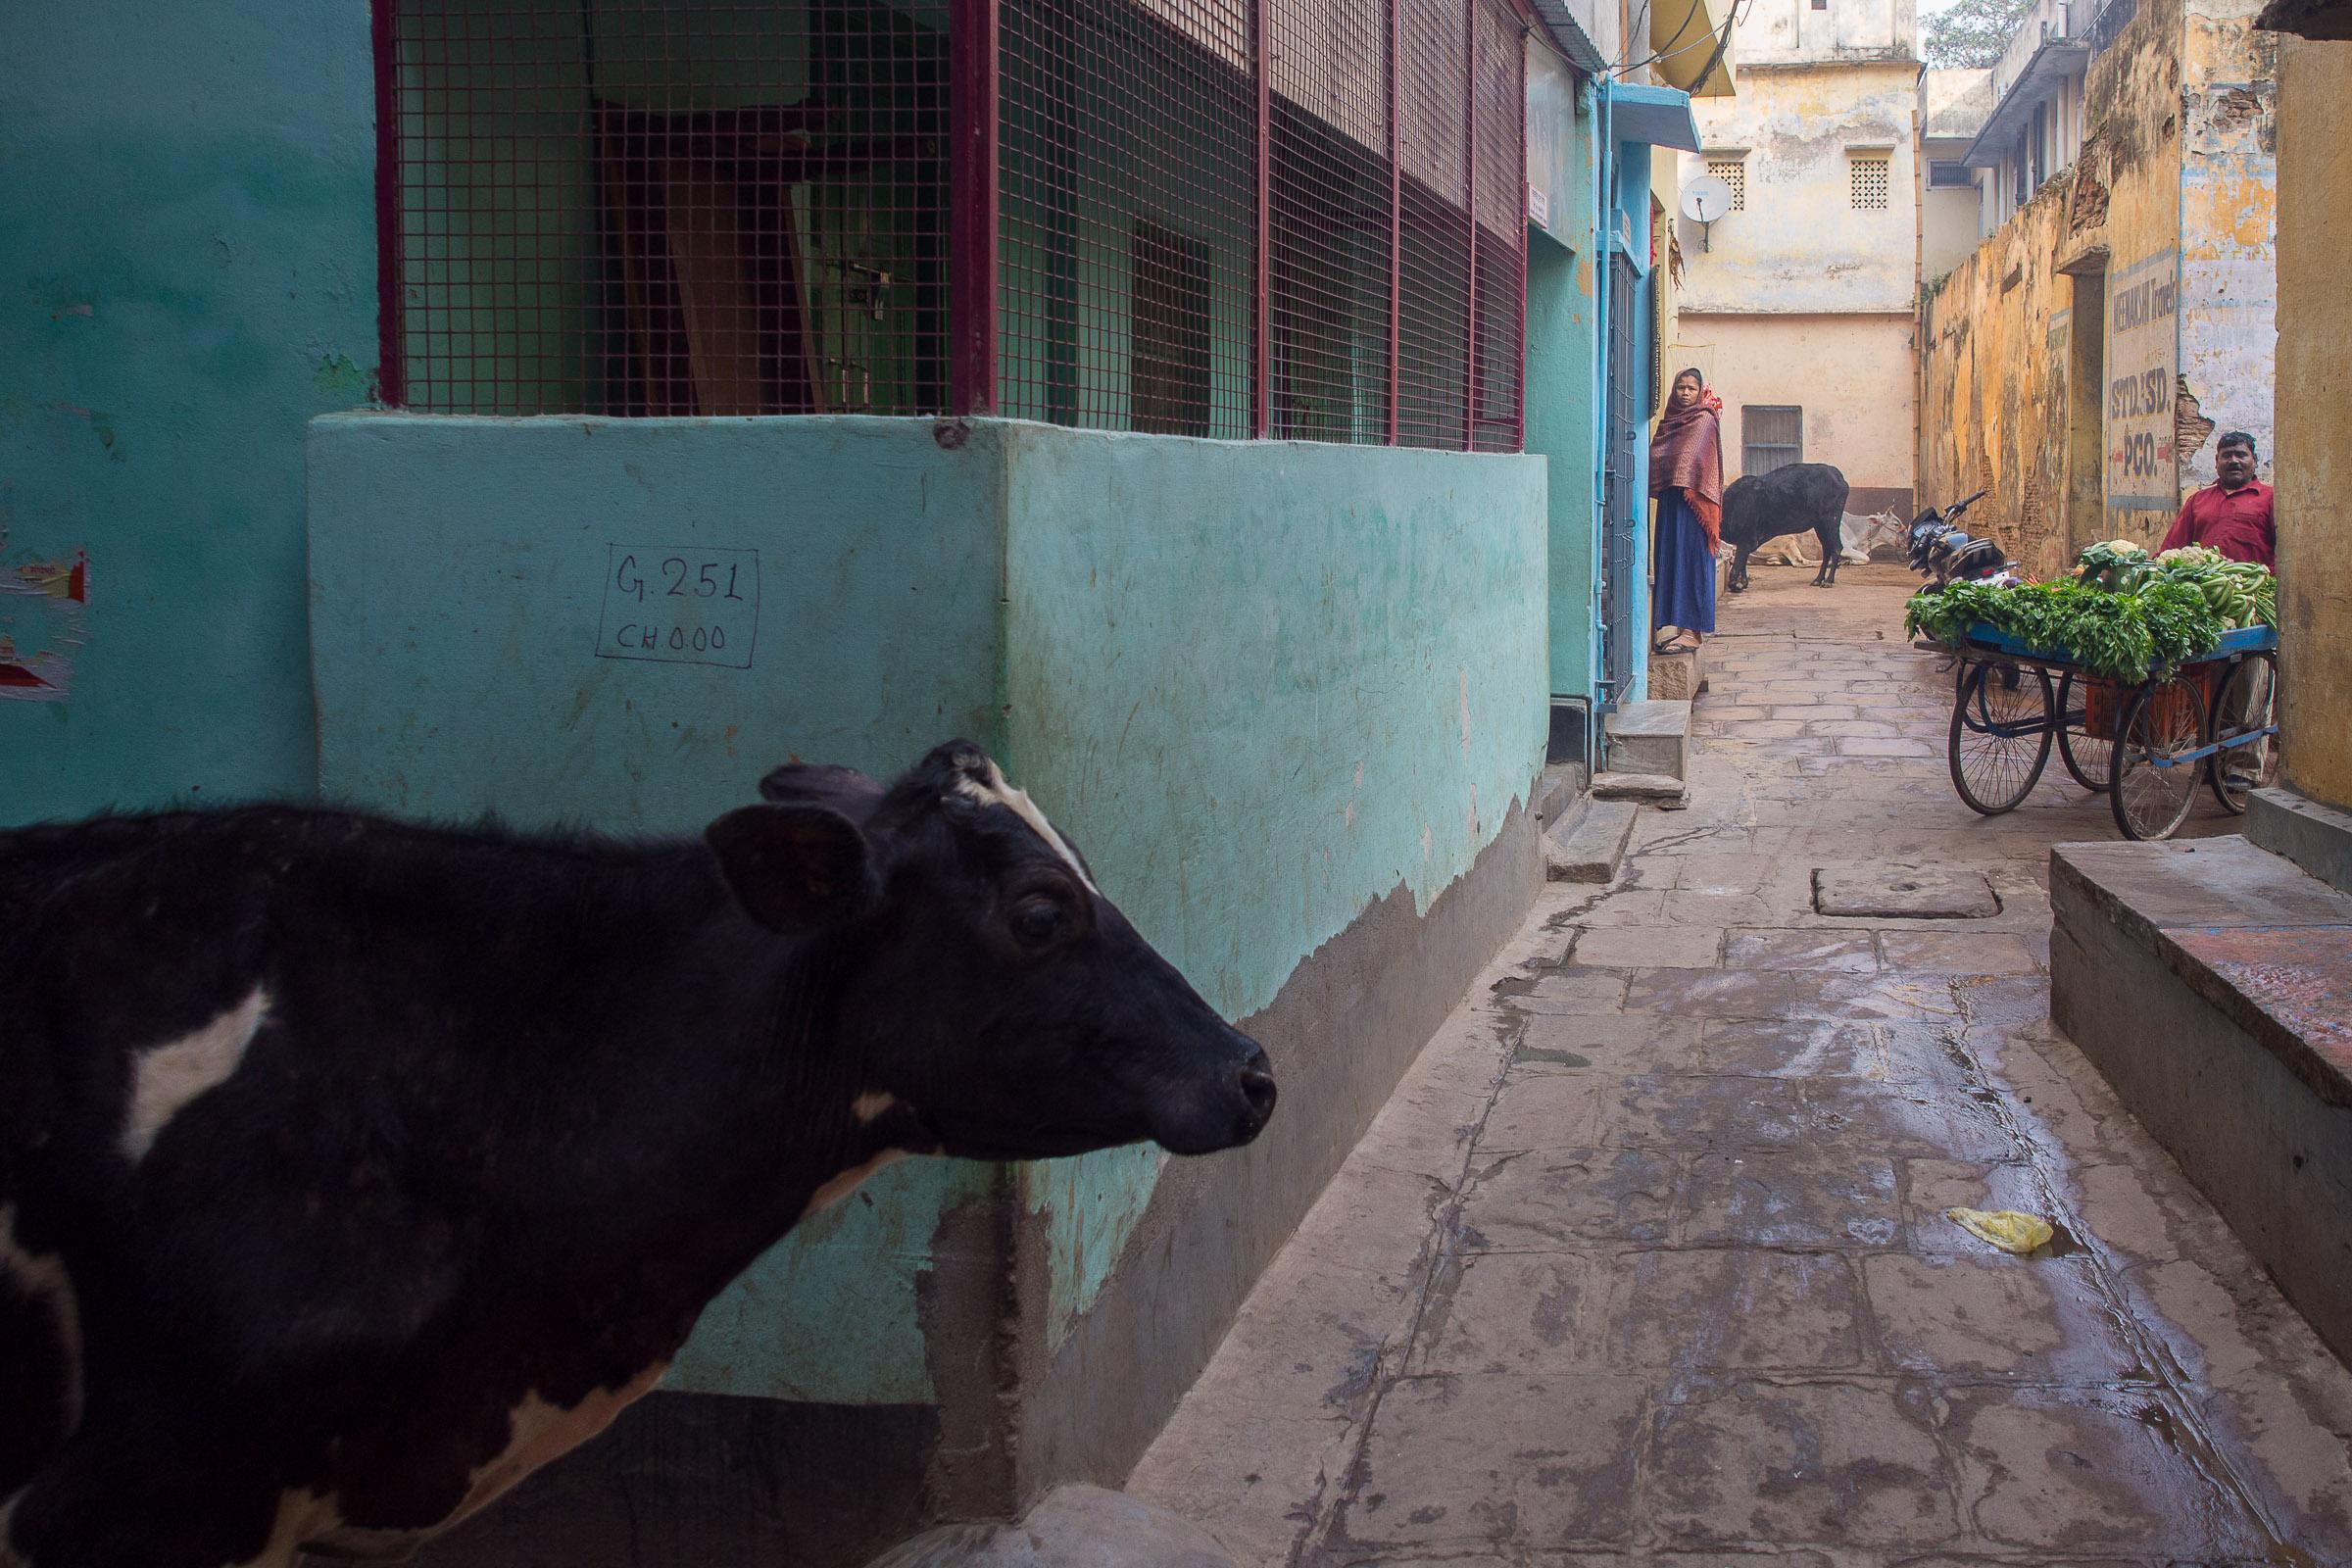 India mon amour - India photography